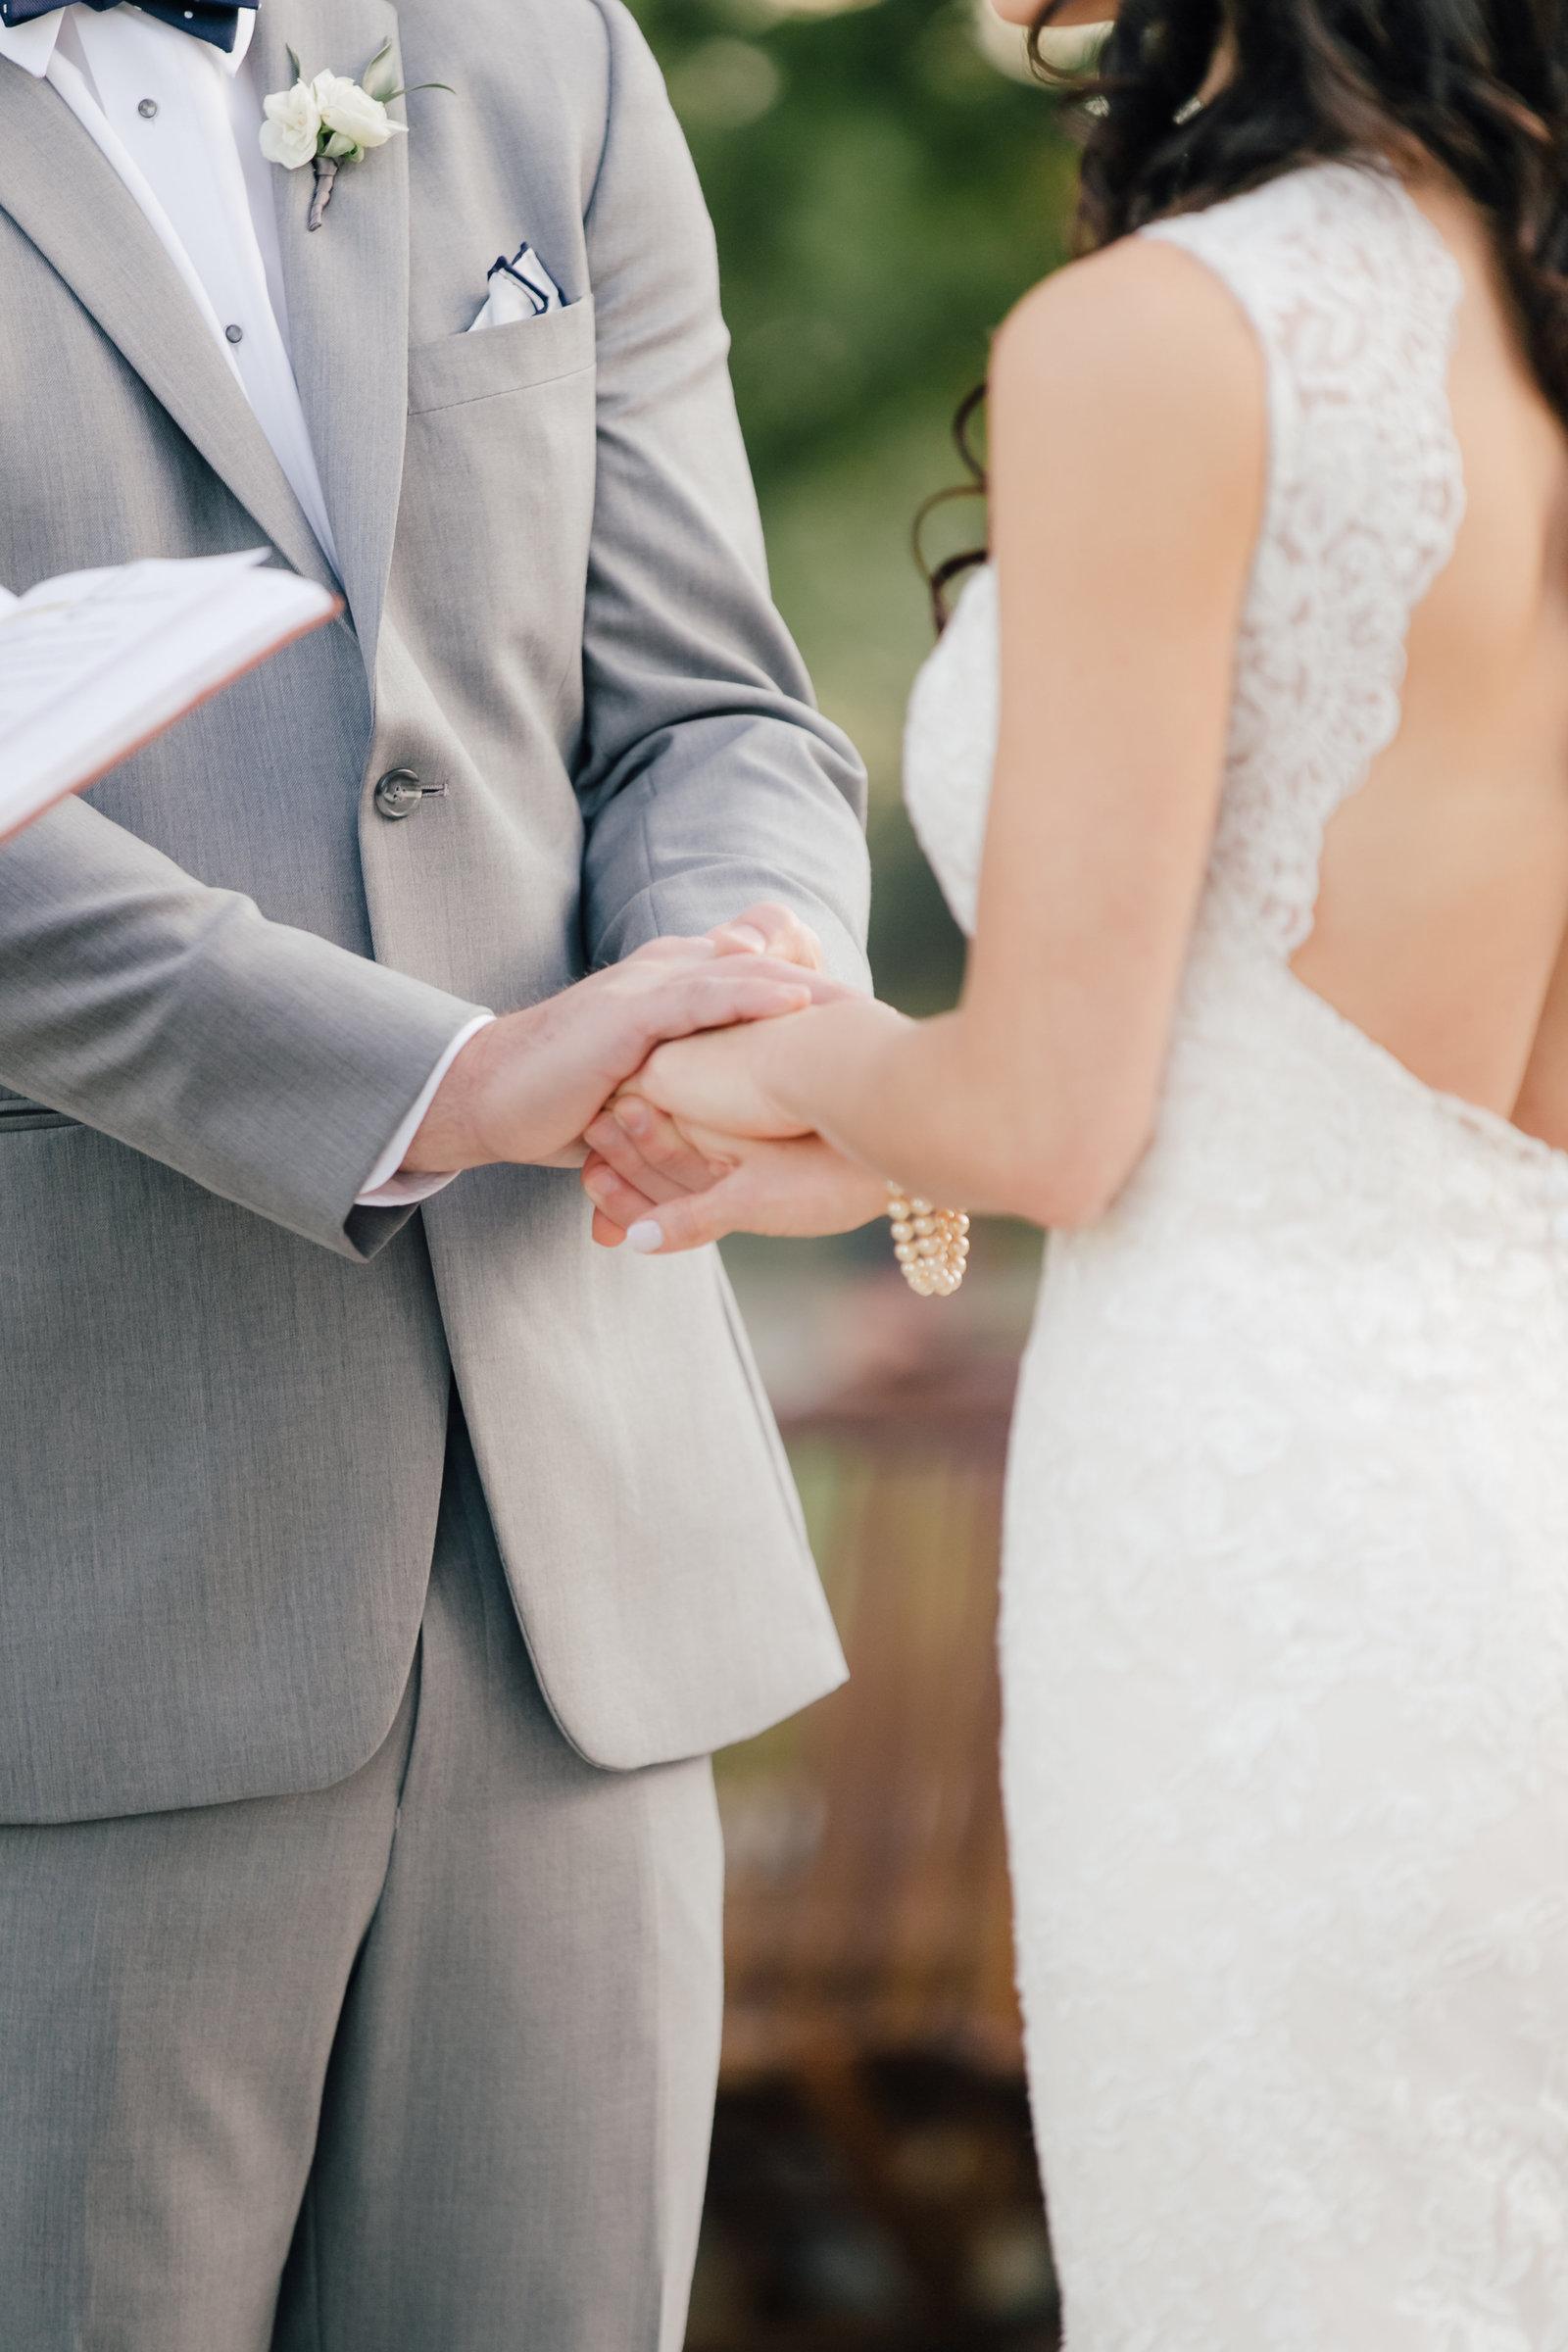 Sarah Goss Wedding Day First Look-2-2